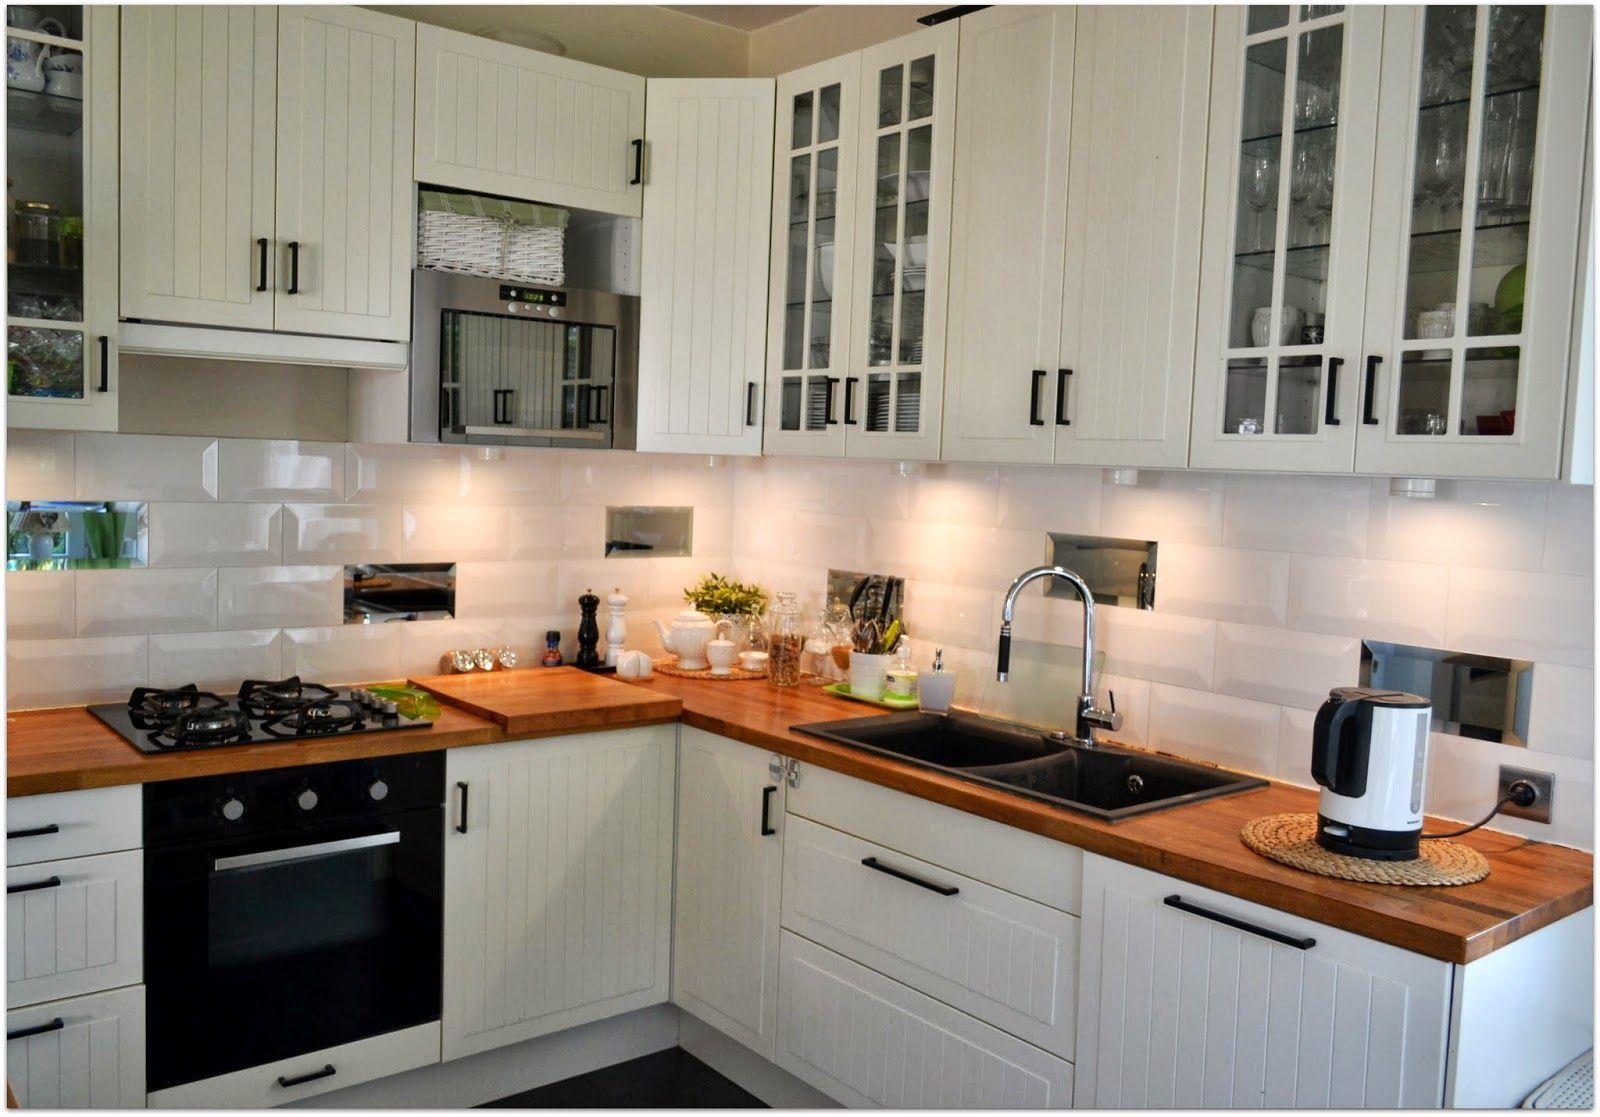 biała kuchnia ikea stat  Szukaj w Google  kuchnia   -> Kuchnia Ikea Wycena